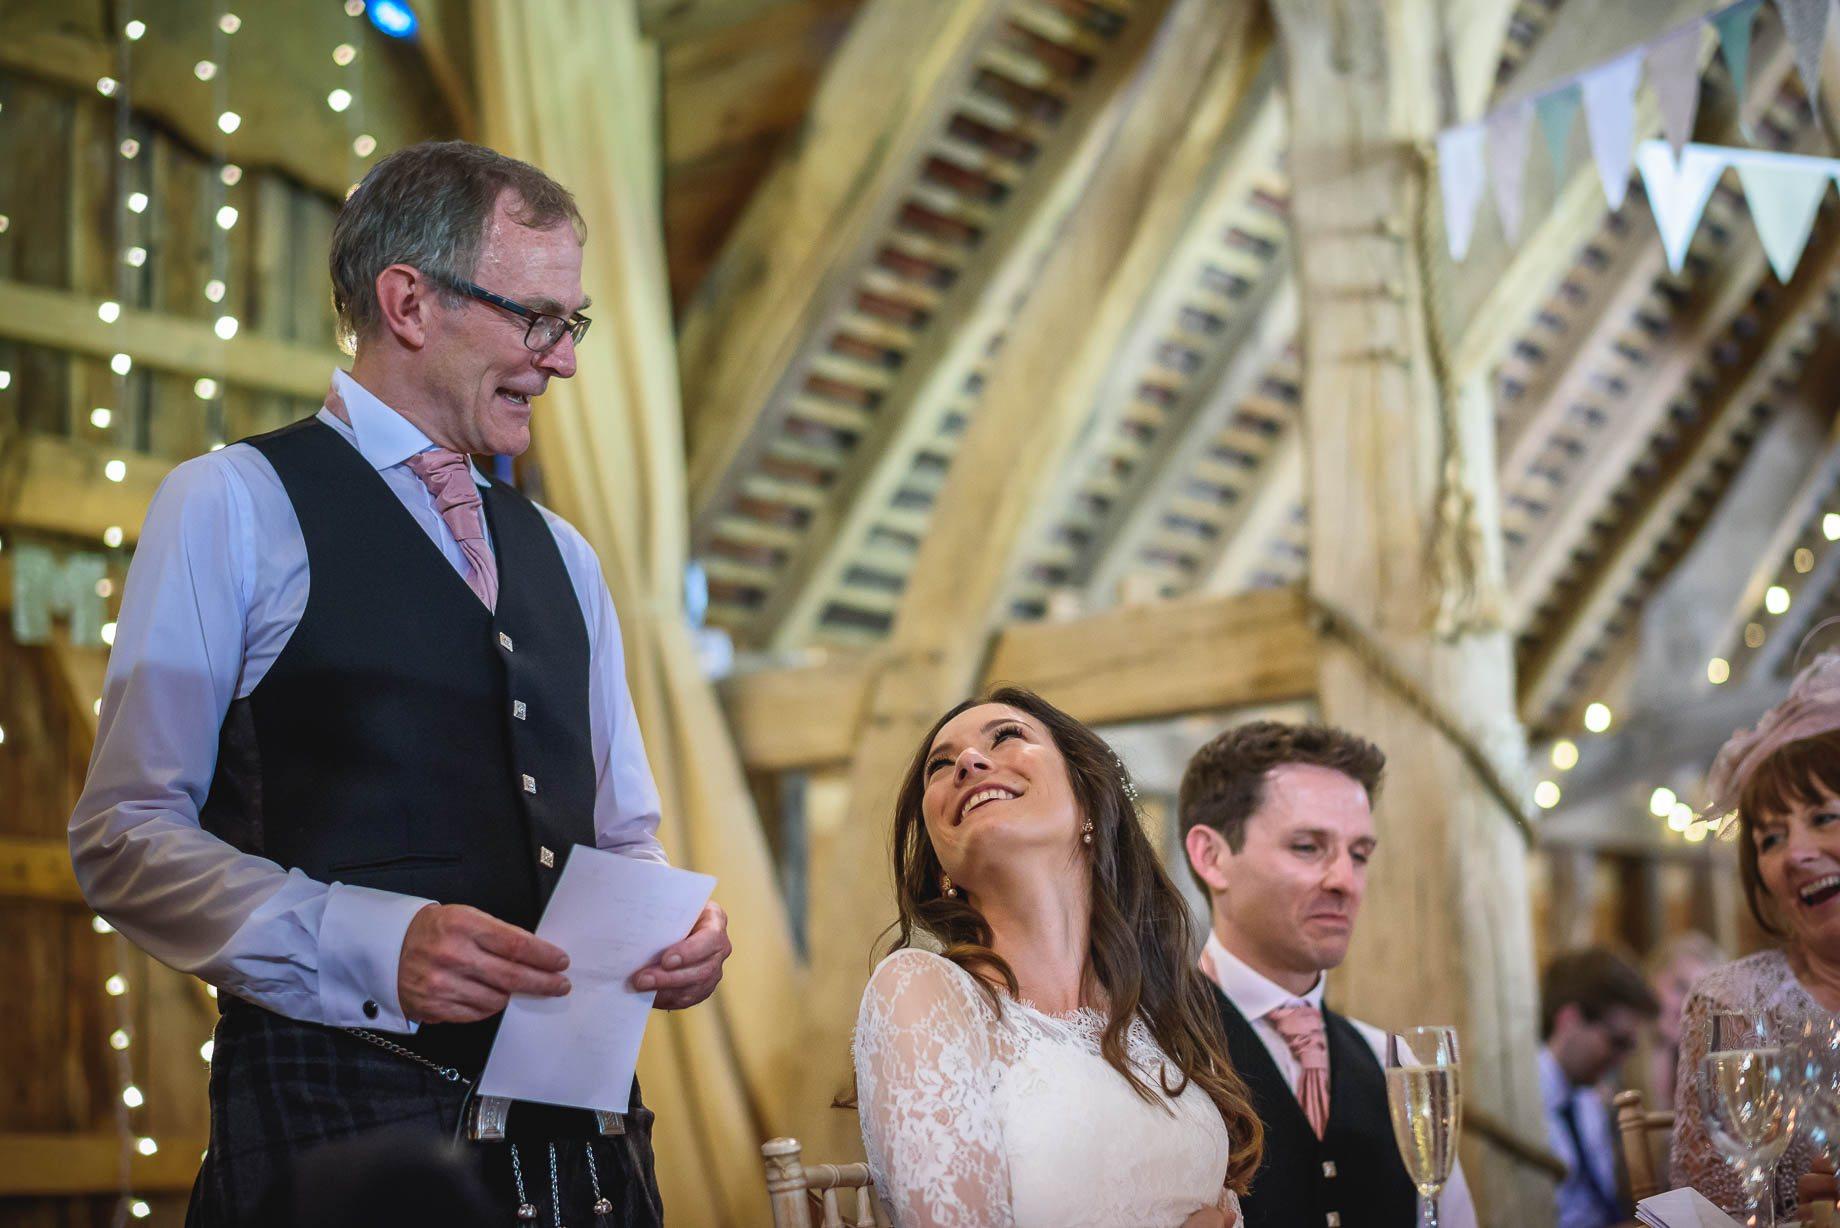 Gildings Barn wedding photography - Sarah and Steve (132 of 190)